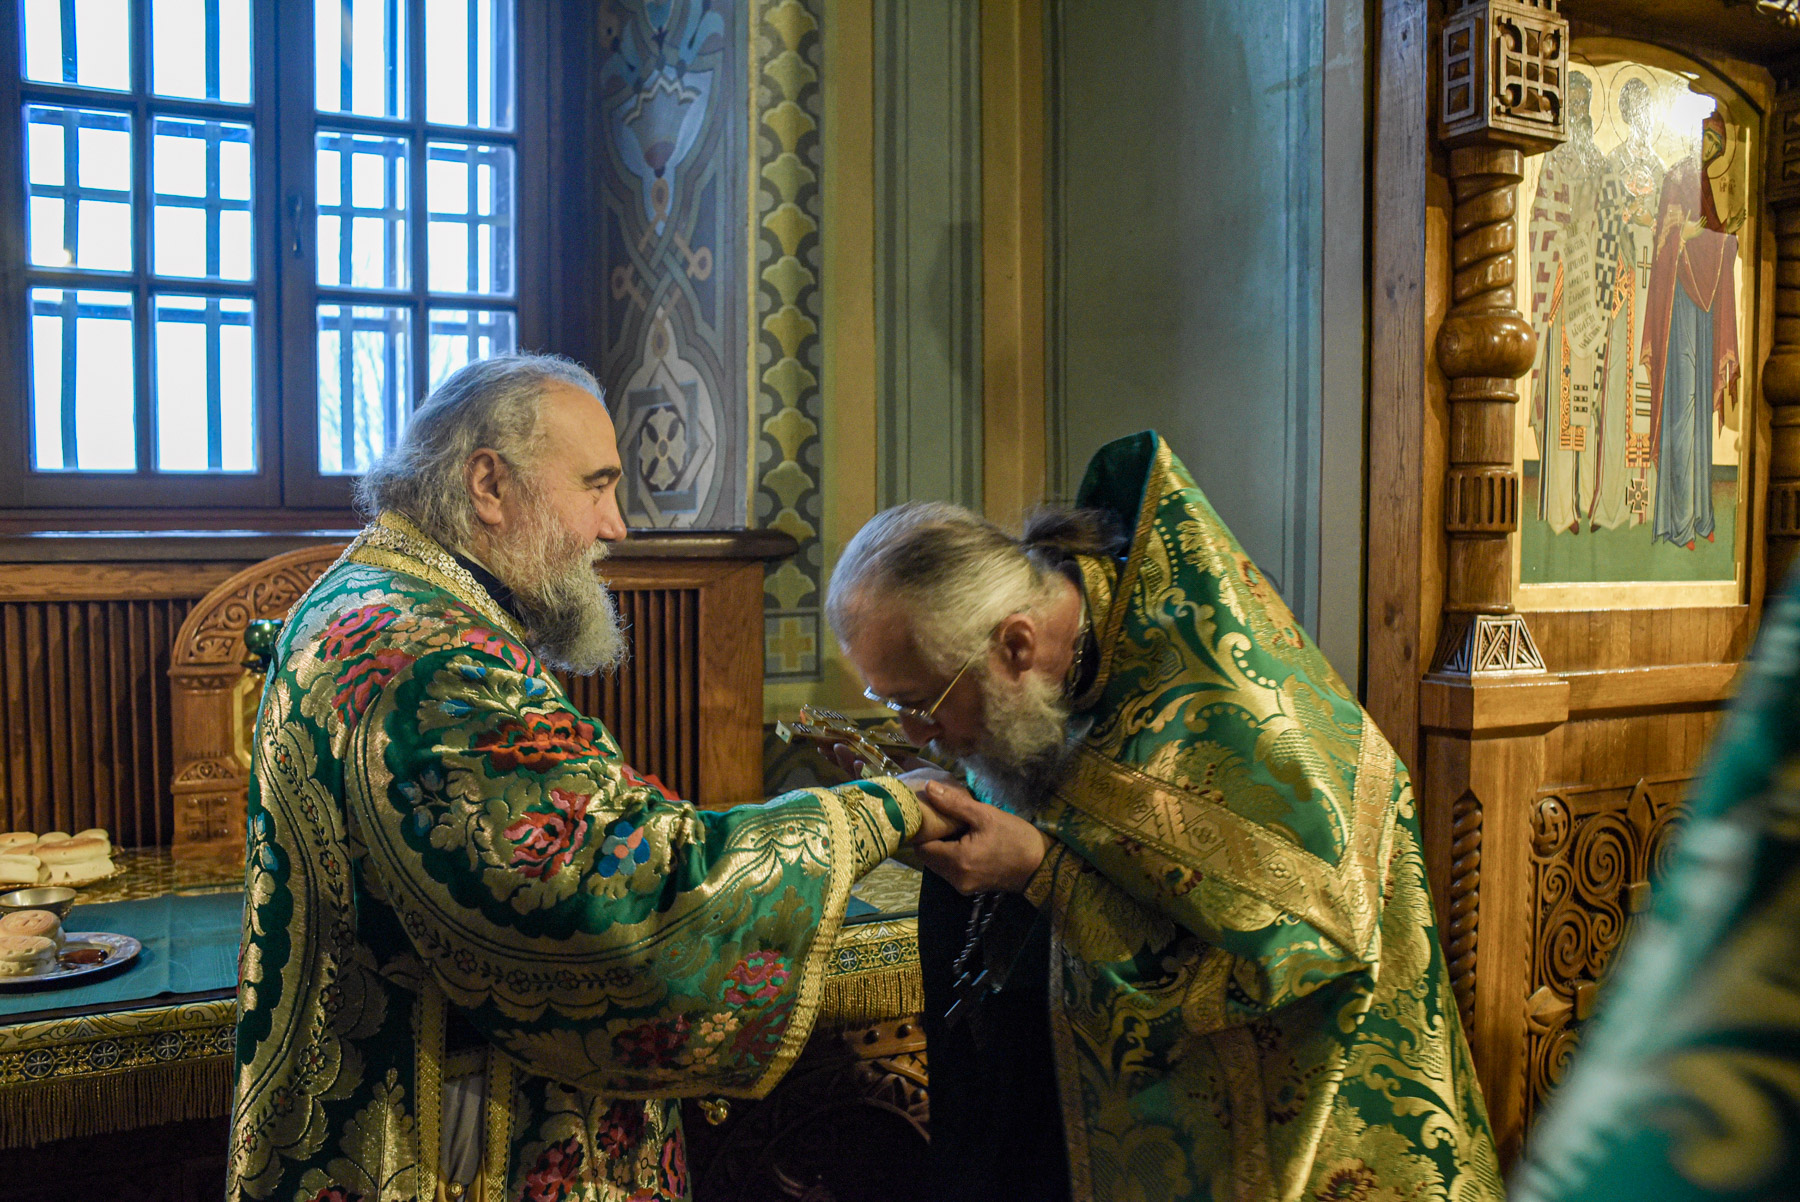 photos of orthodox christmas 0164 2